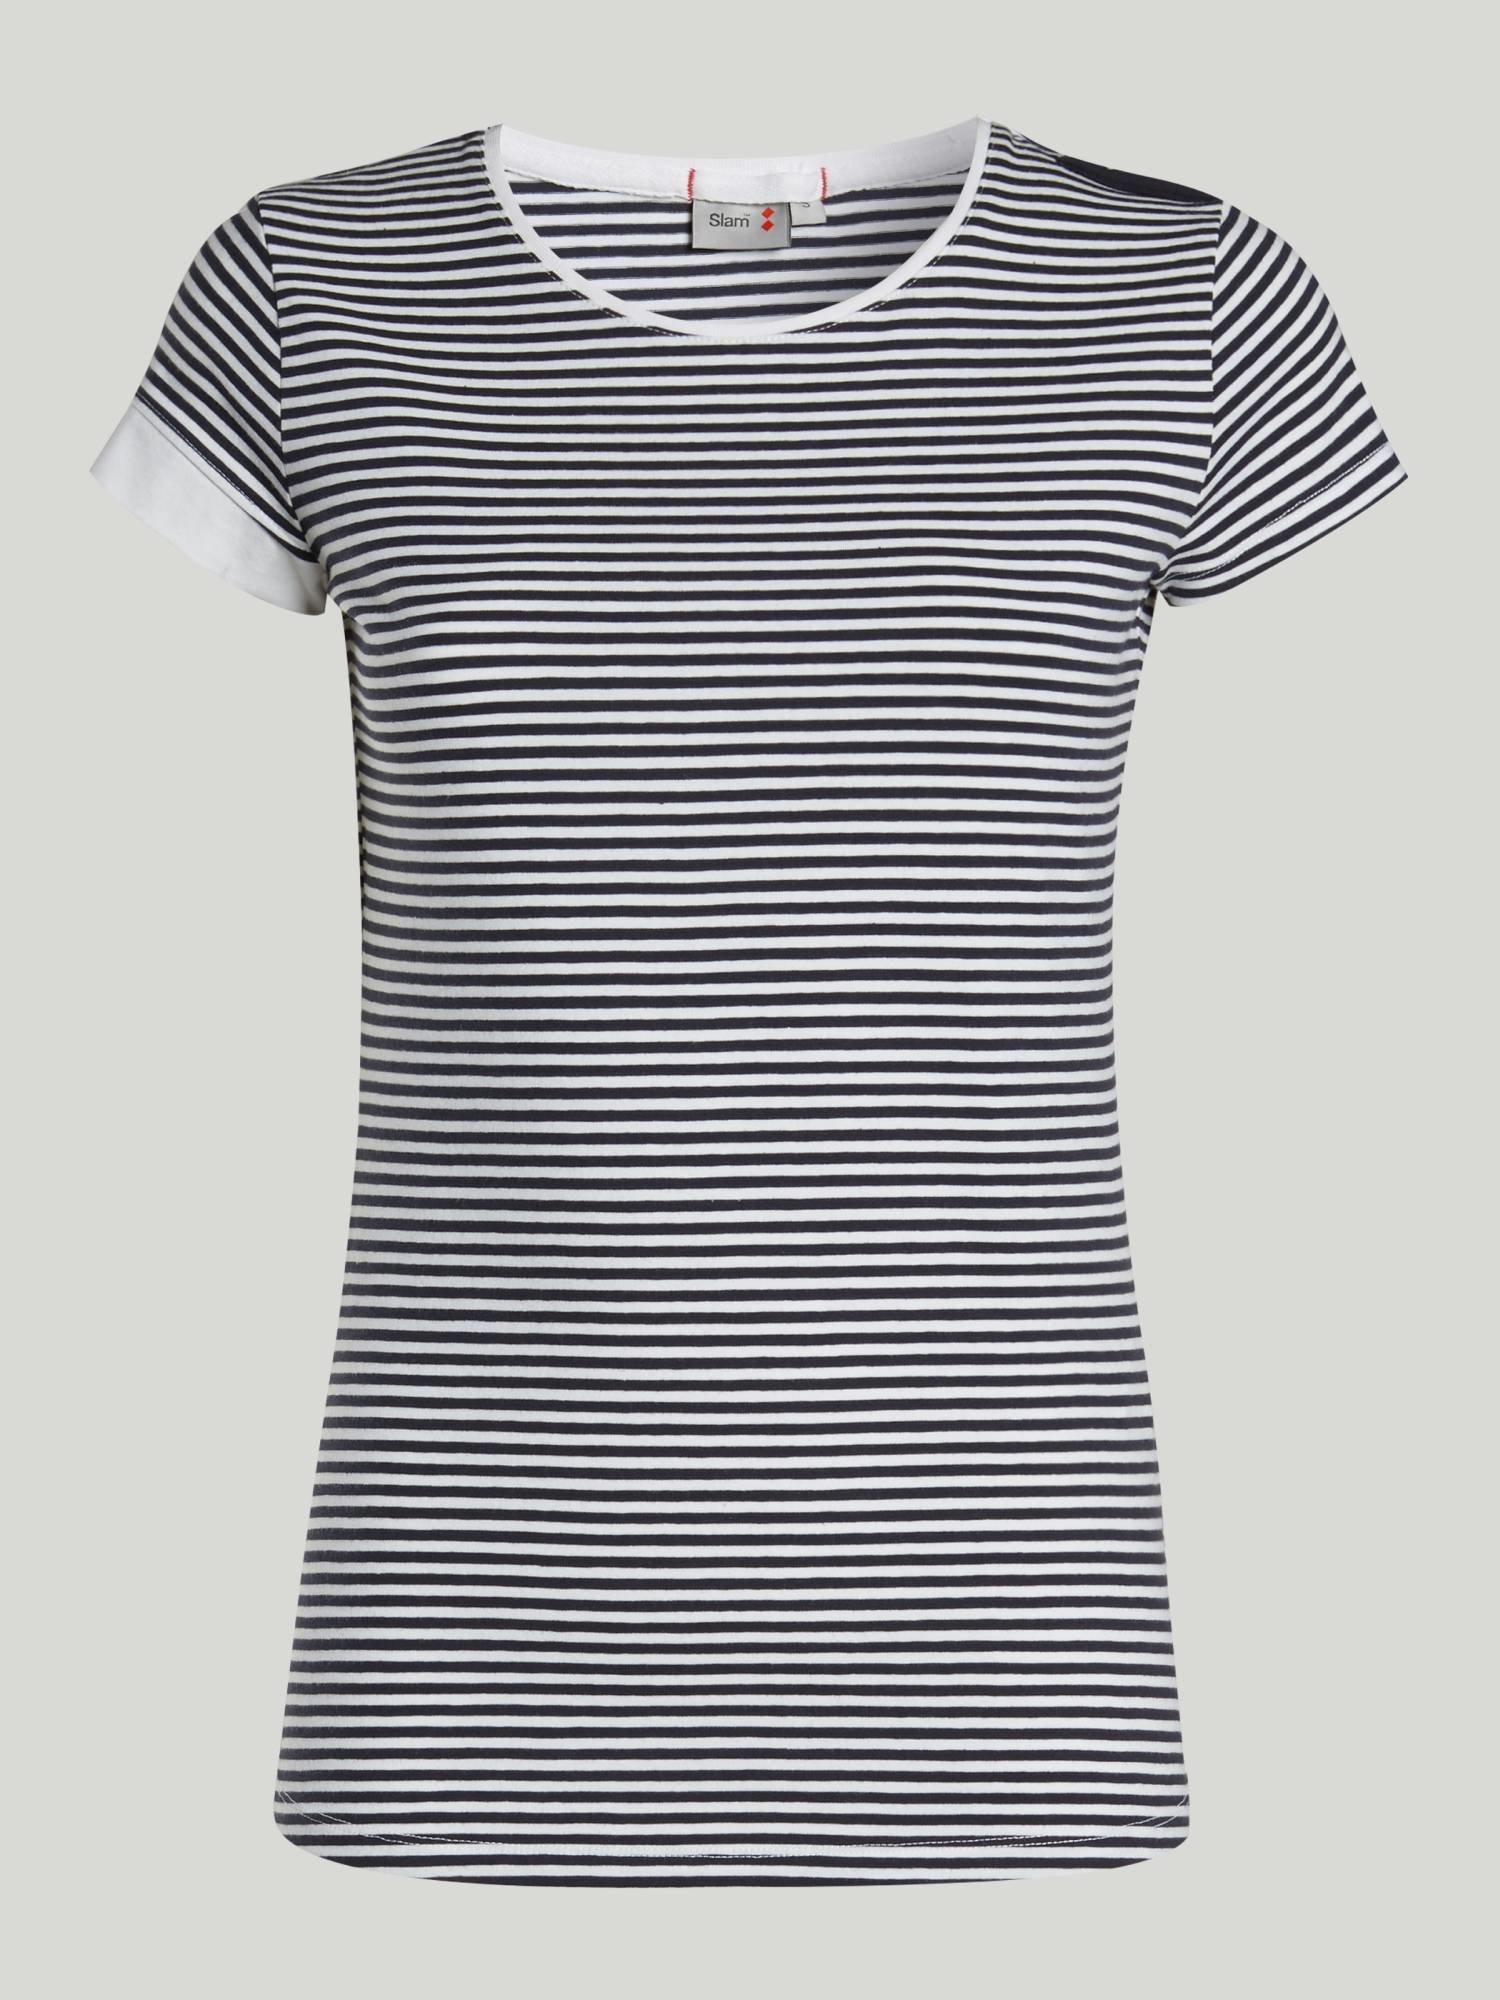 T-Shirt A119 - Azul Marino / Blanco